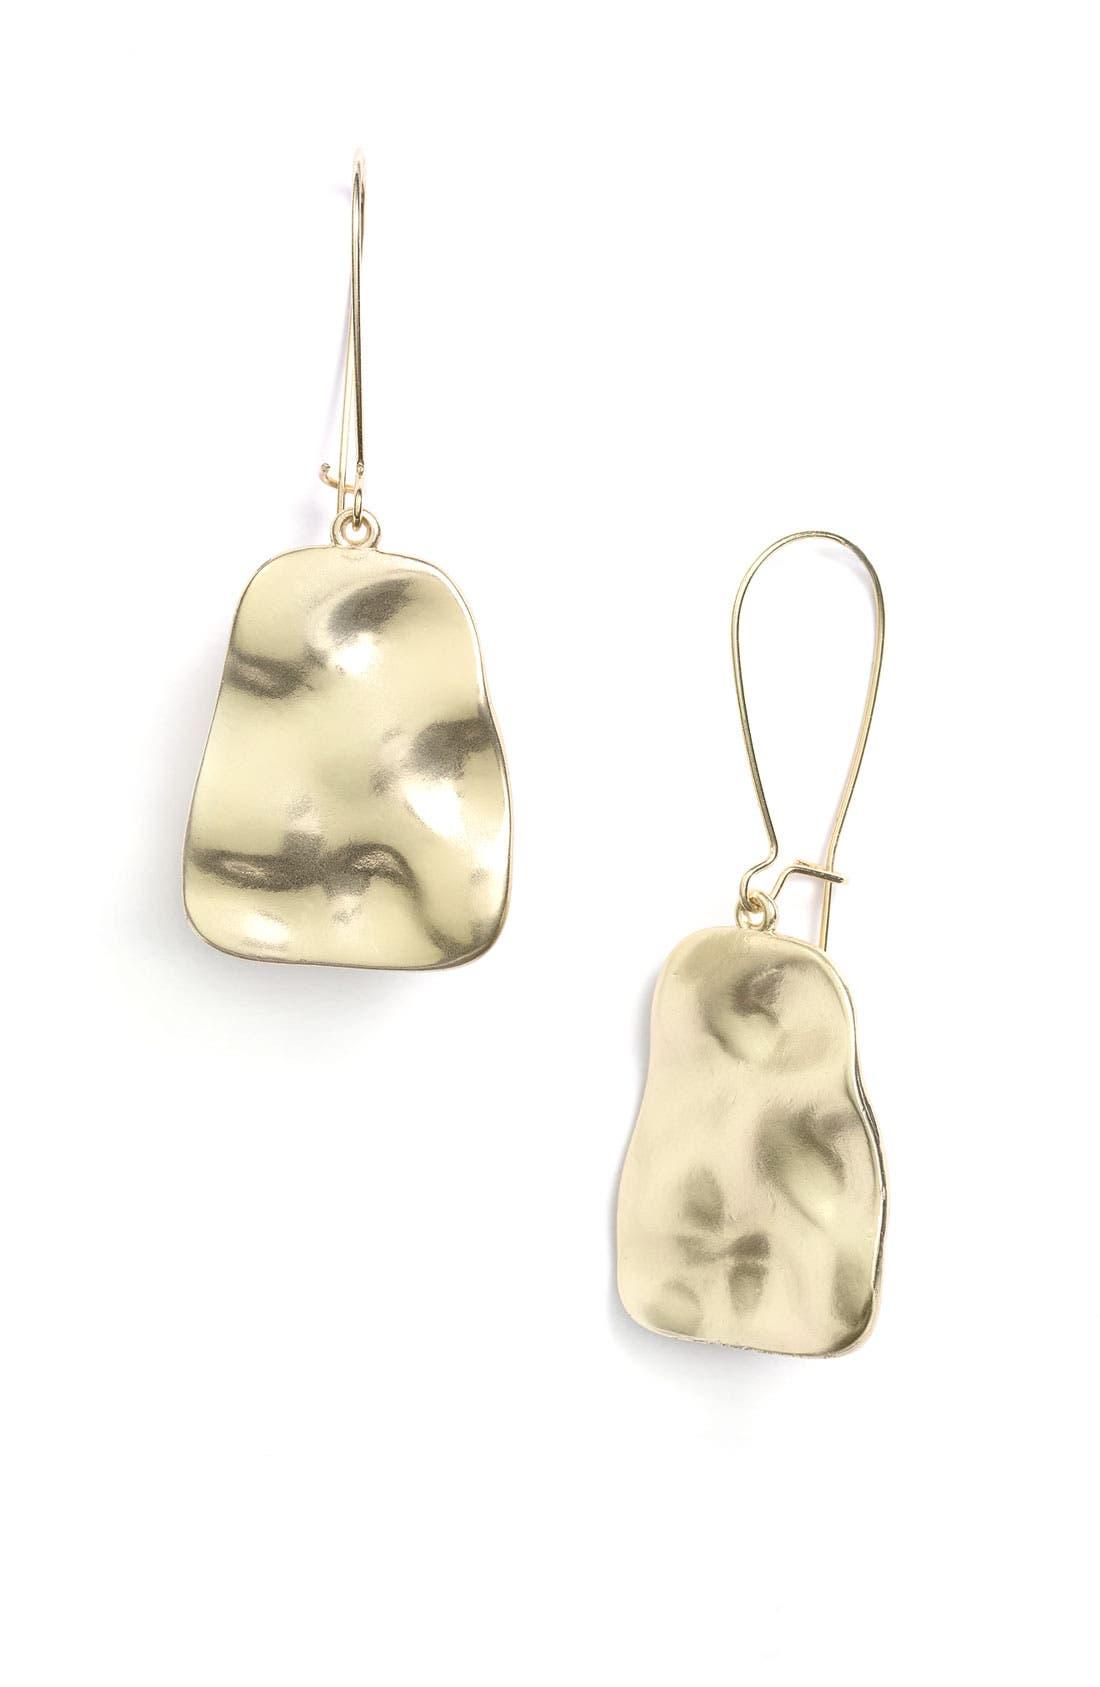 Alternate Image 1 Selected - Nordstrom 'Gold Water' Textured Drop Earrings